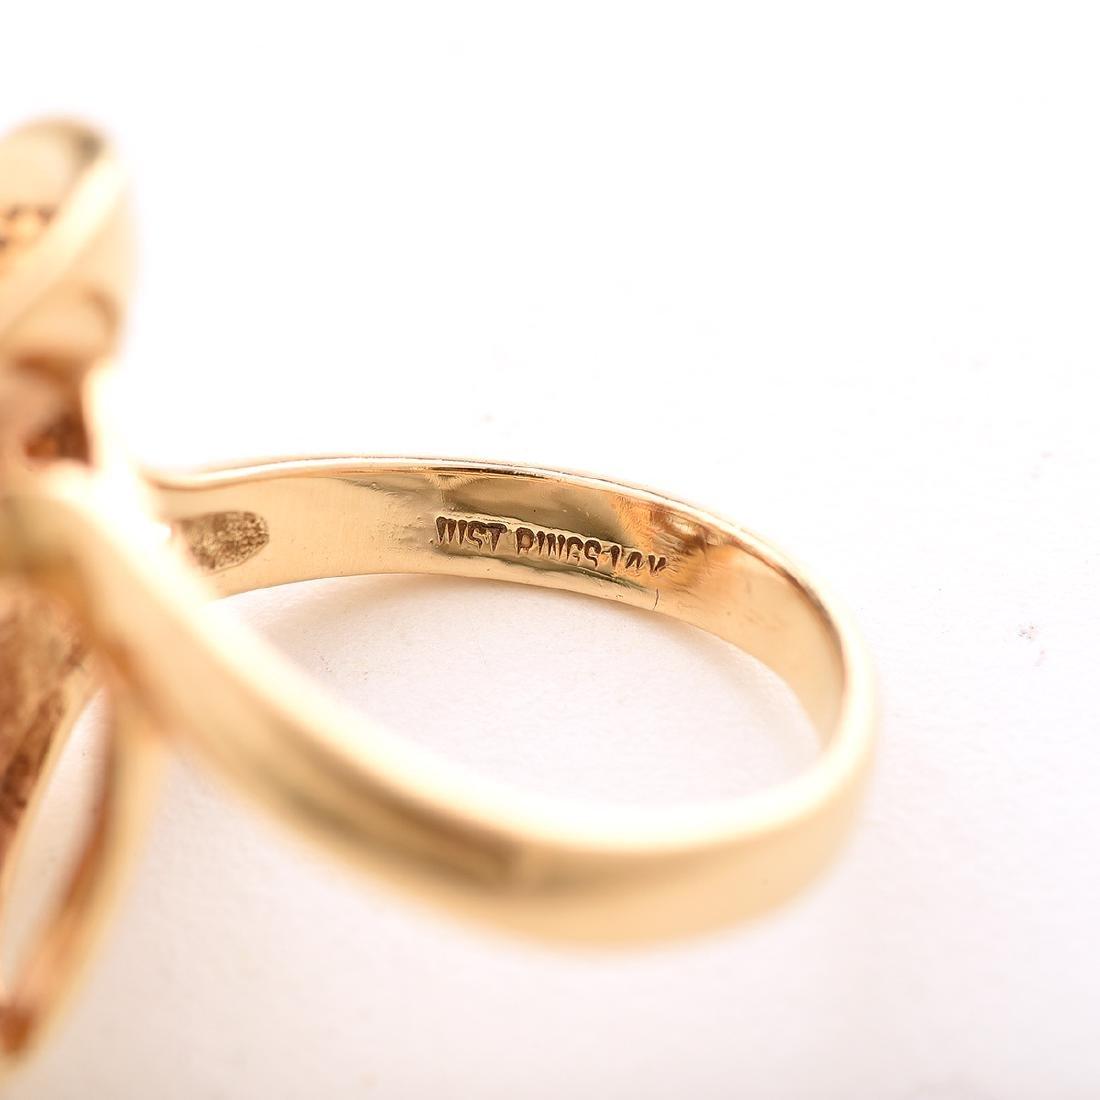 Diamond, 14k Yellow Gold Ring. - 4